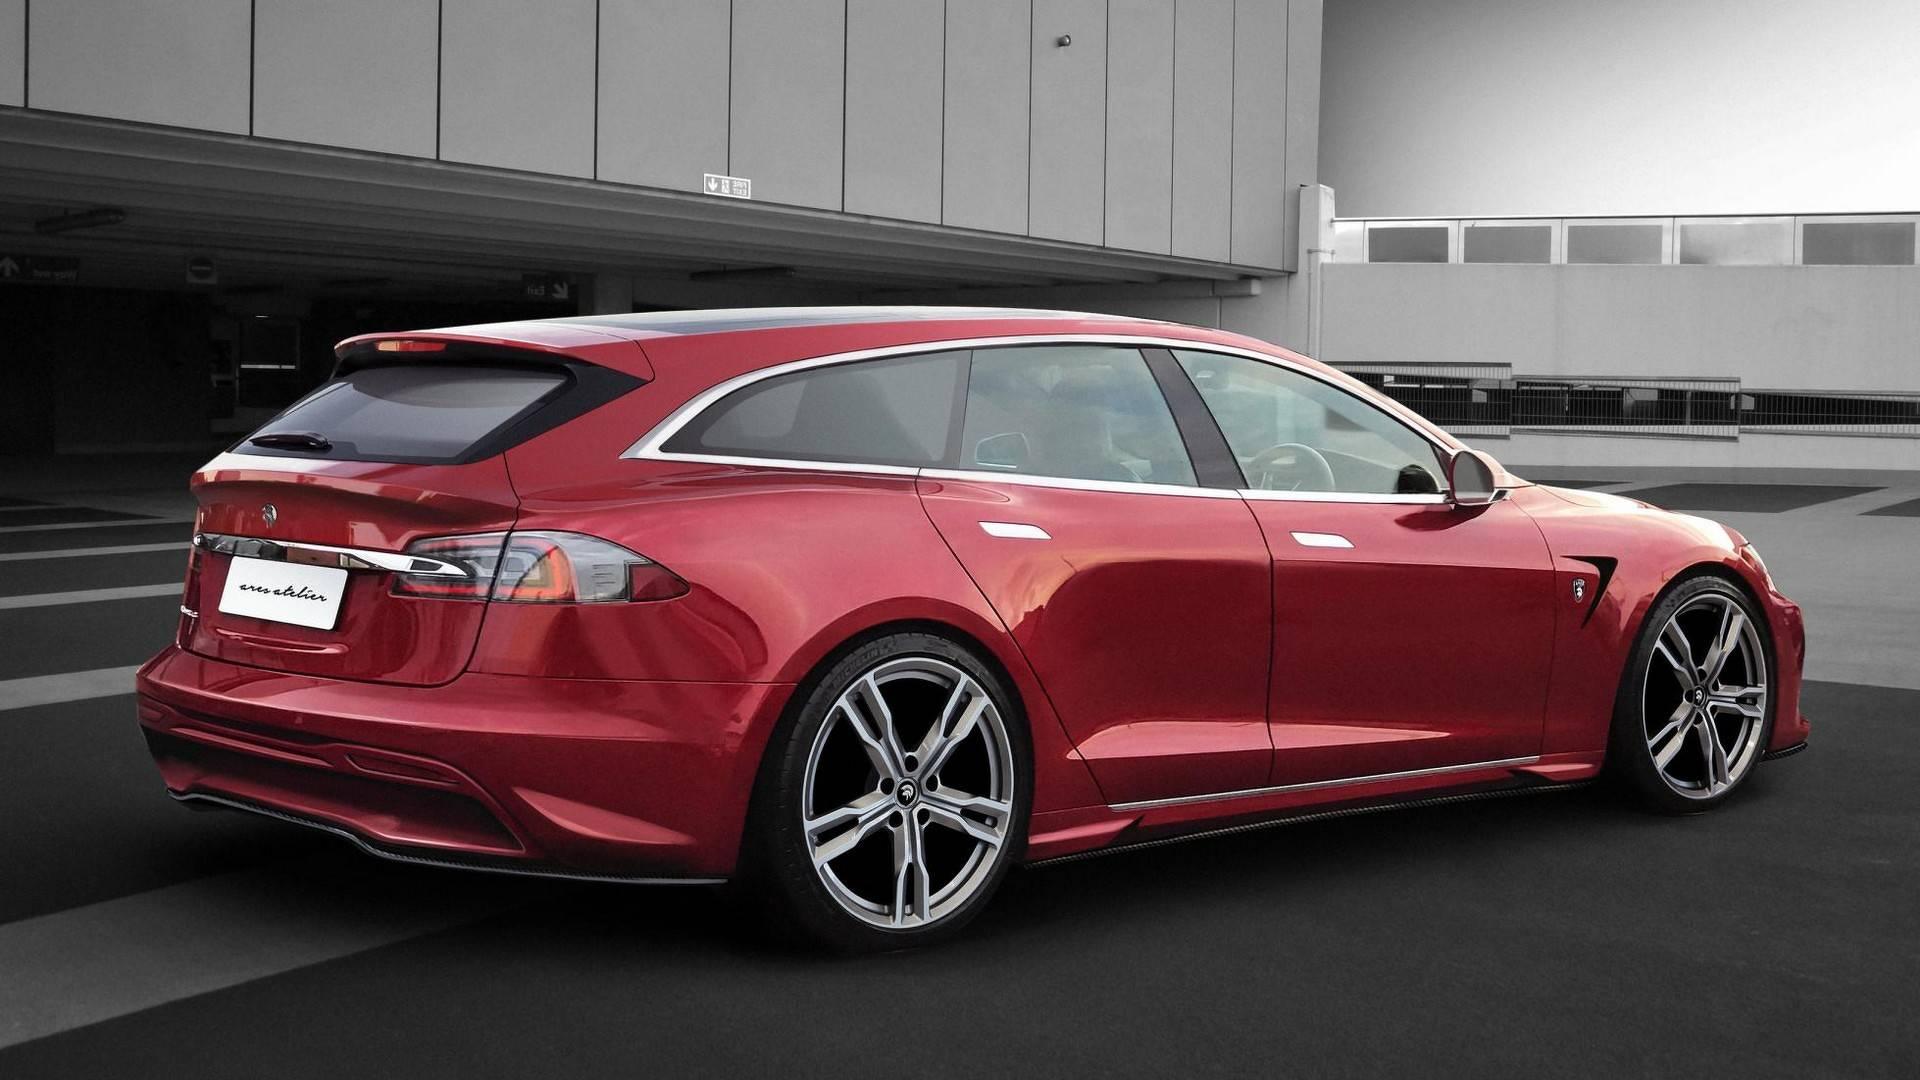 ares-design-tesla-model-s-wagon (2)